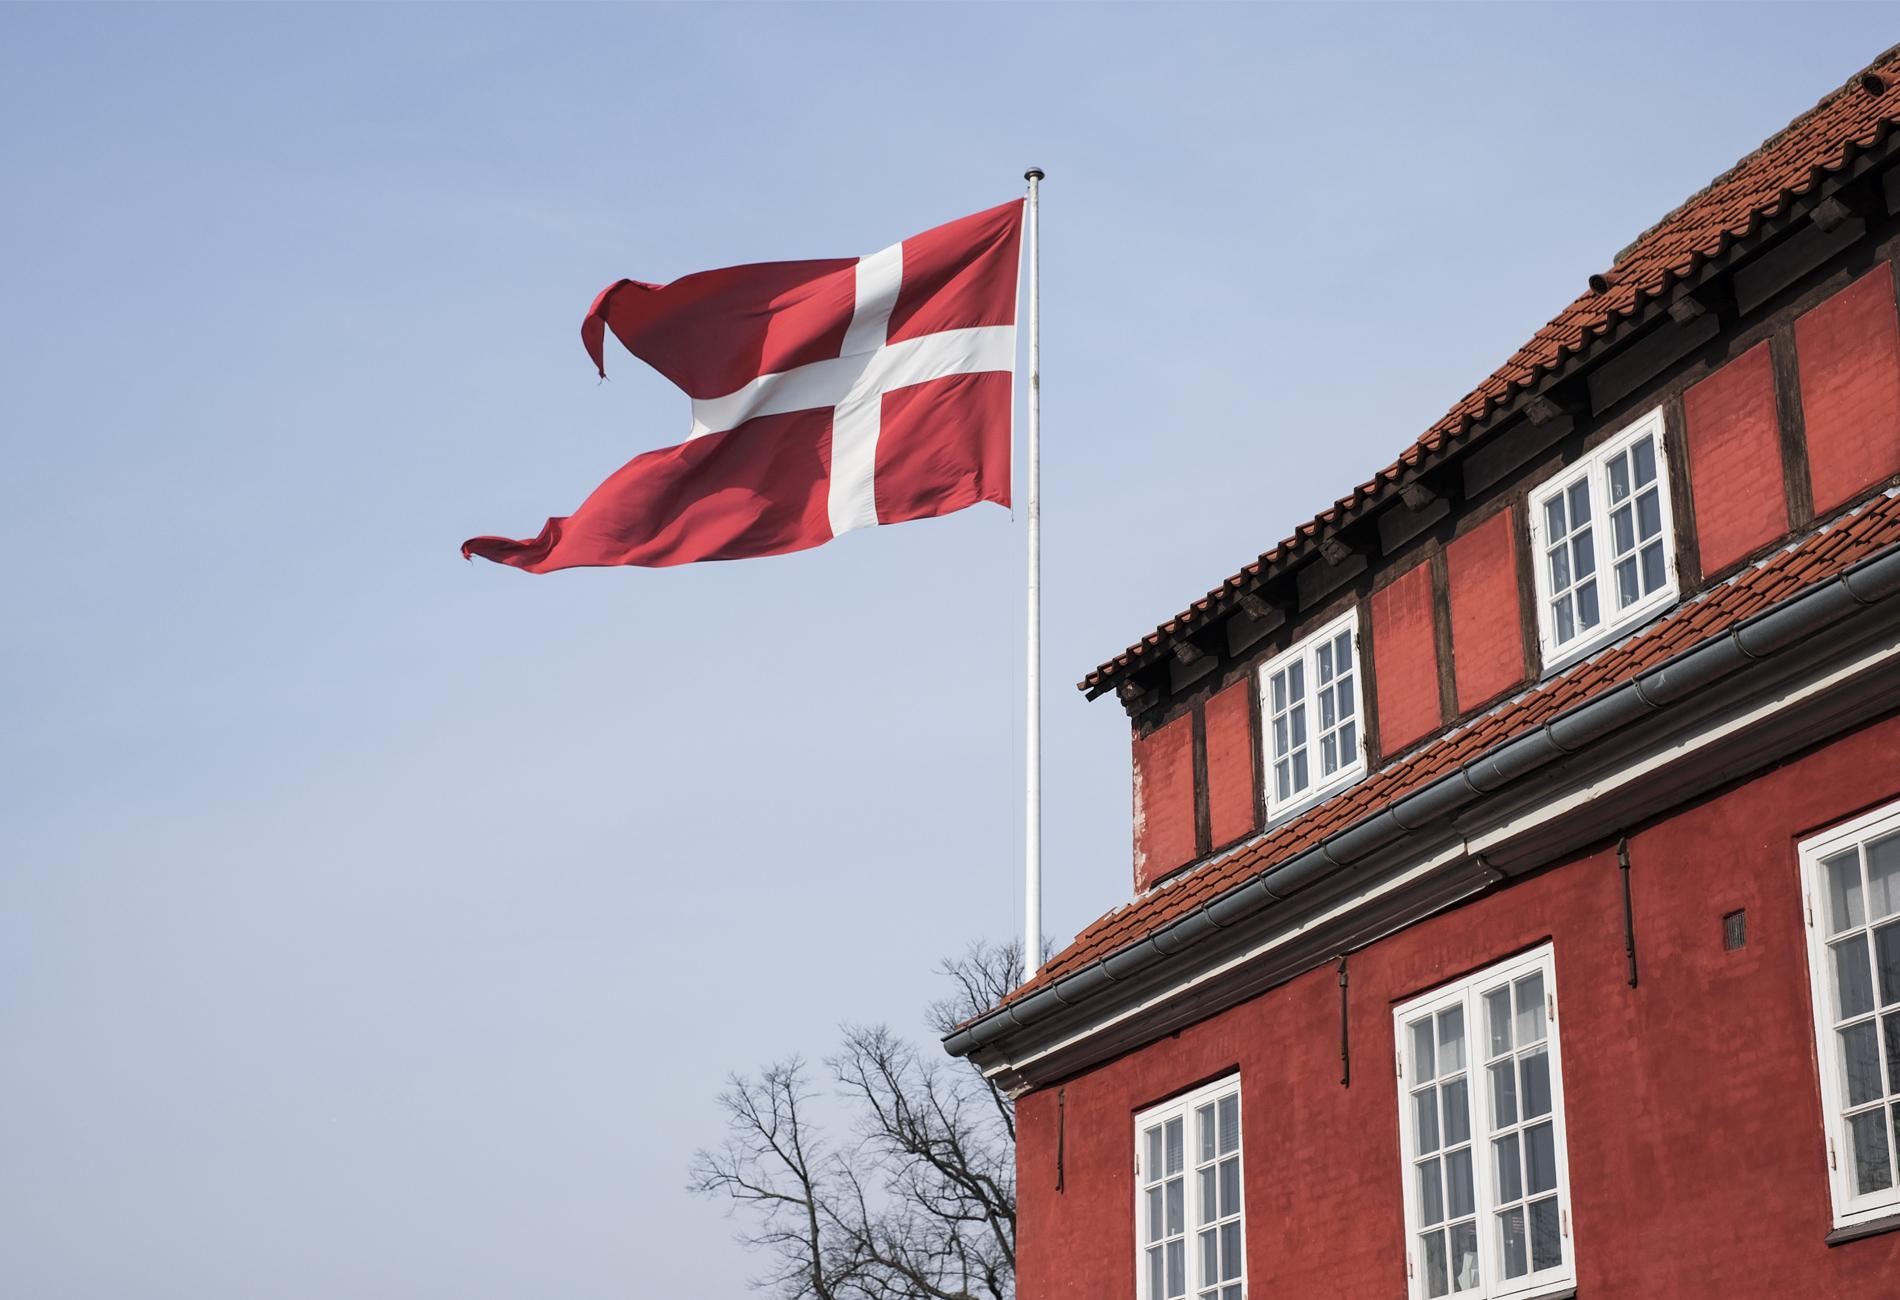 Danish flag red